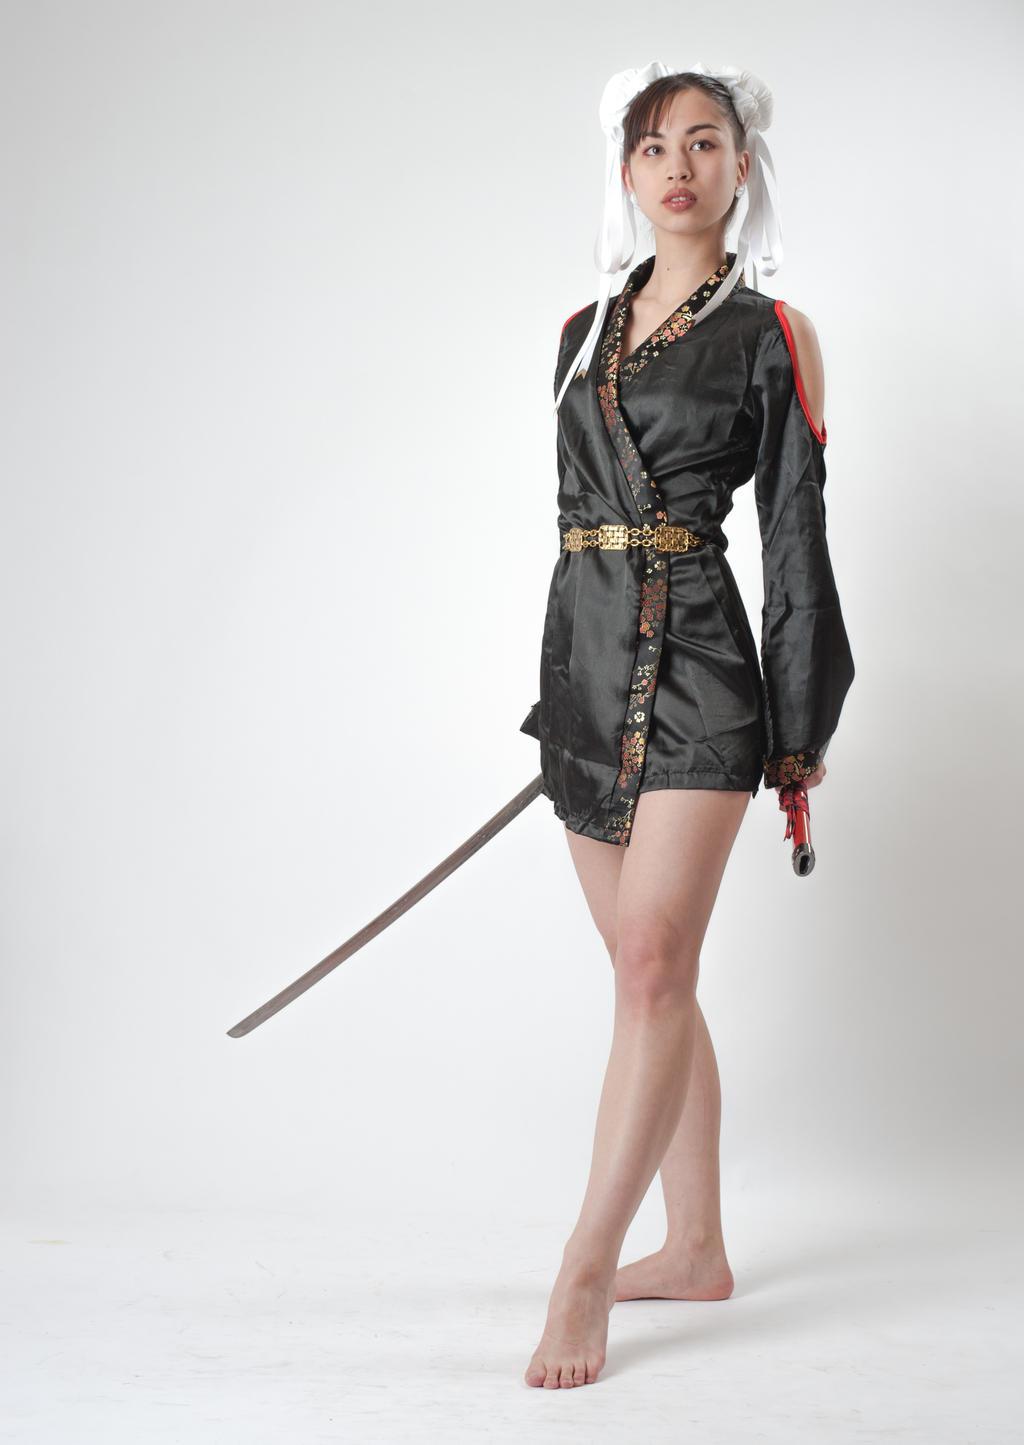 Vanessa Chun Li Original 2a by jagged-eye